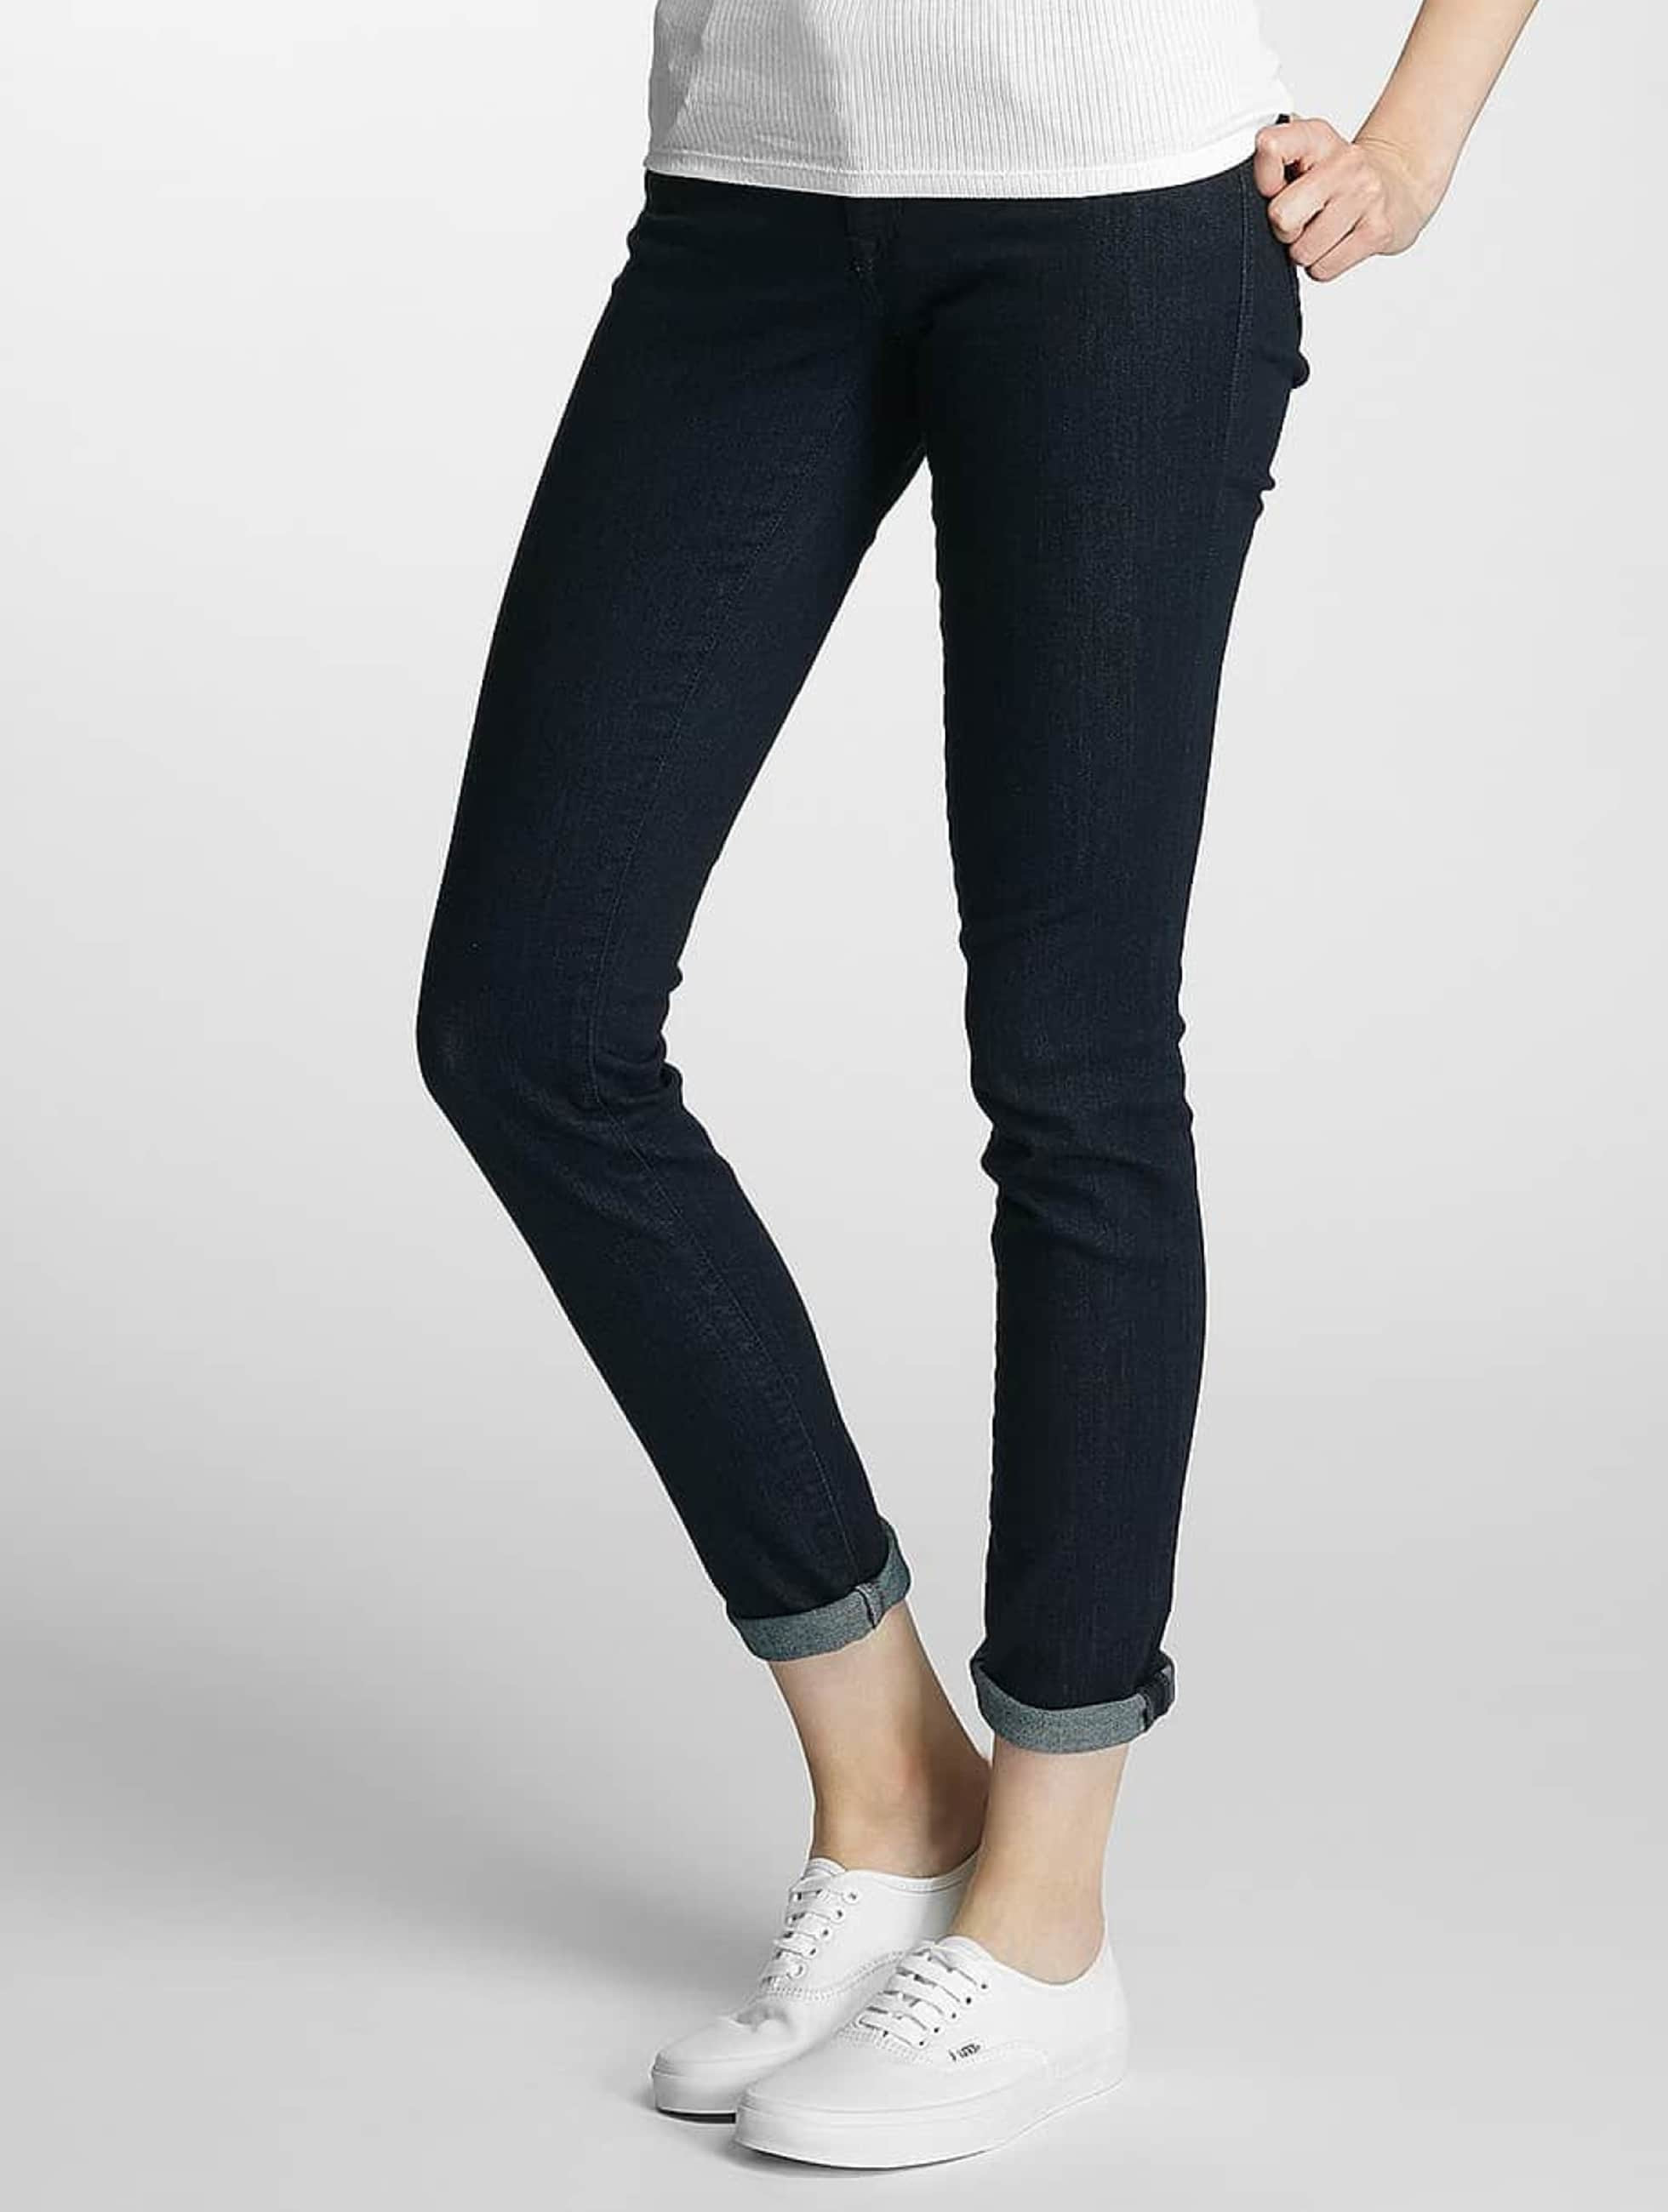 mavi jeans jeans skinny jeans lindy in blauw 355251. Black Bedroom Furniture Sets. Home Design Ideas